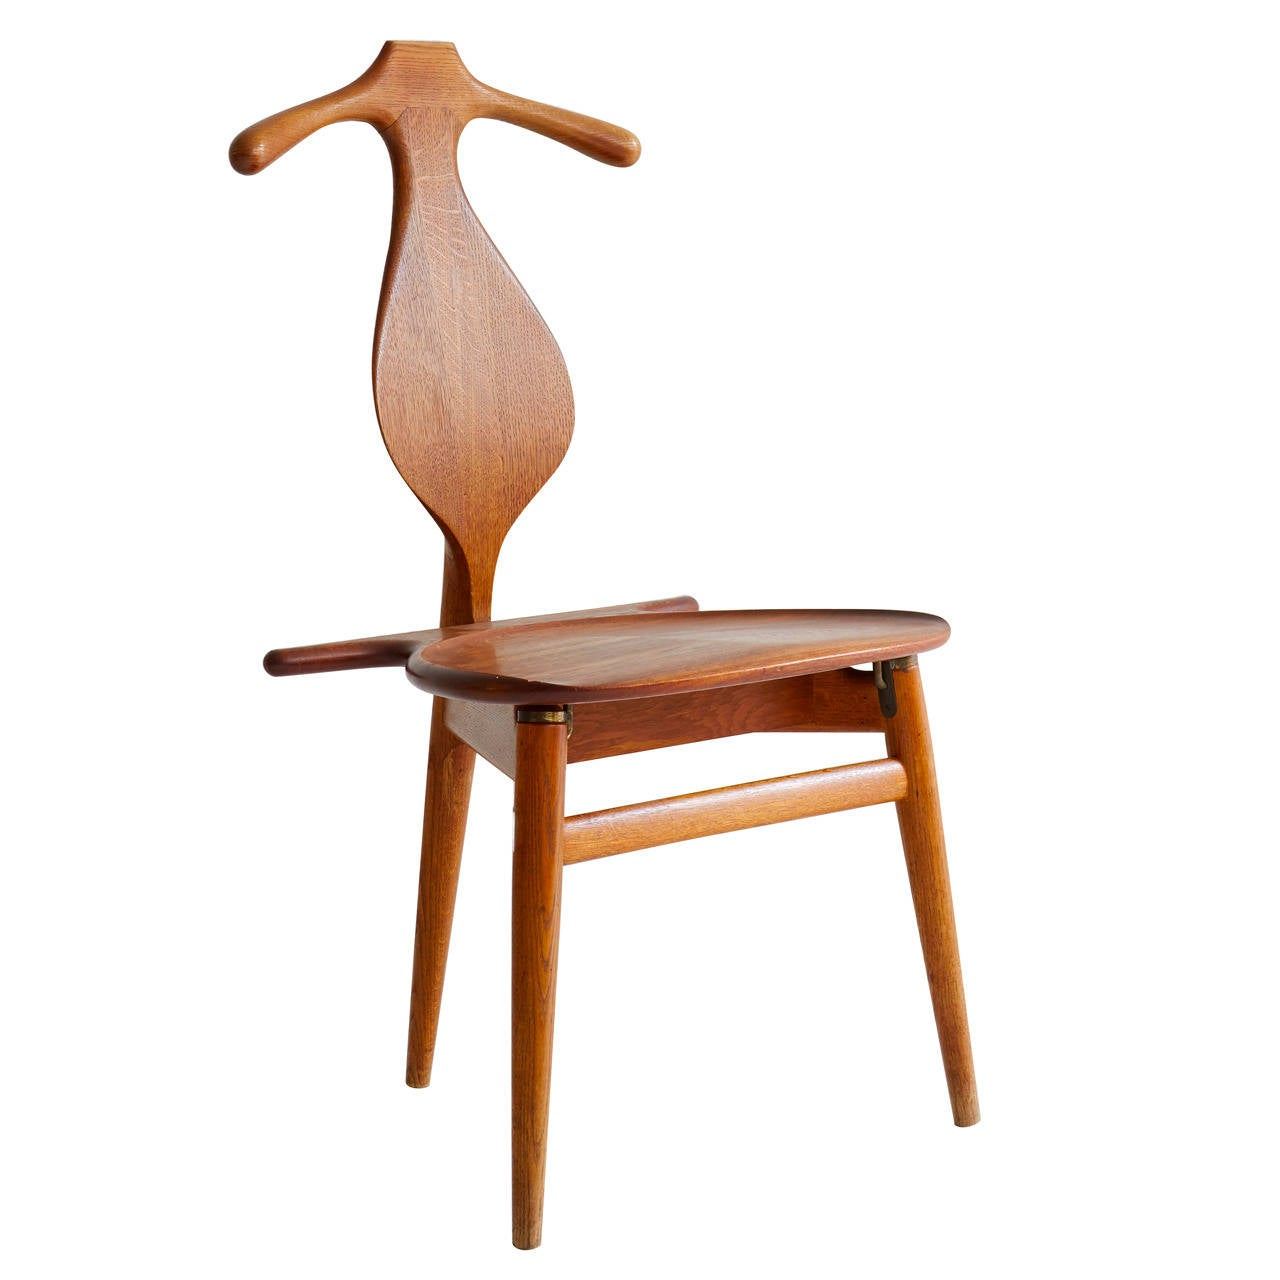 Hans wegner valet chair at 1stdibs for Furniture 4 u